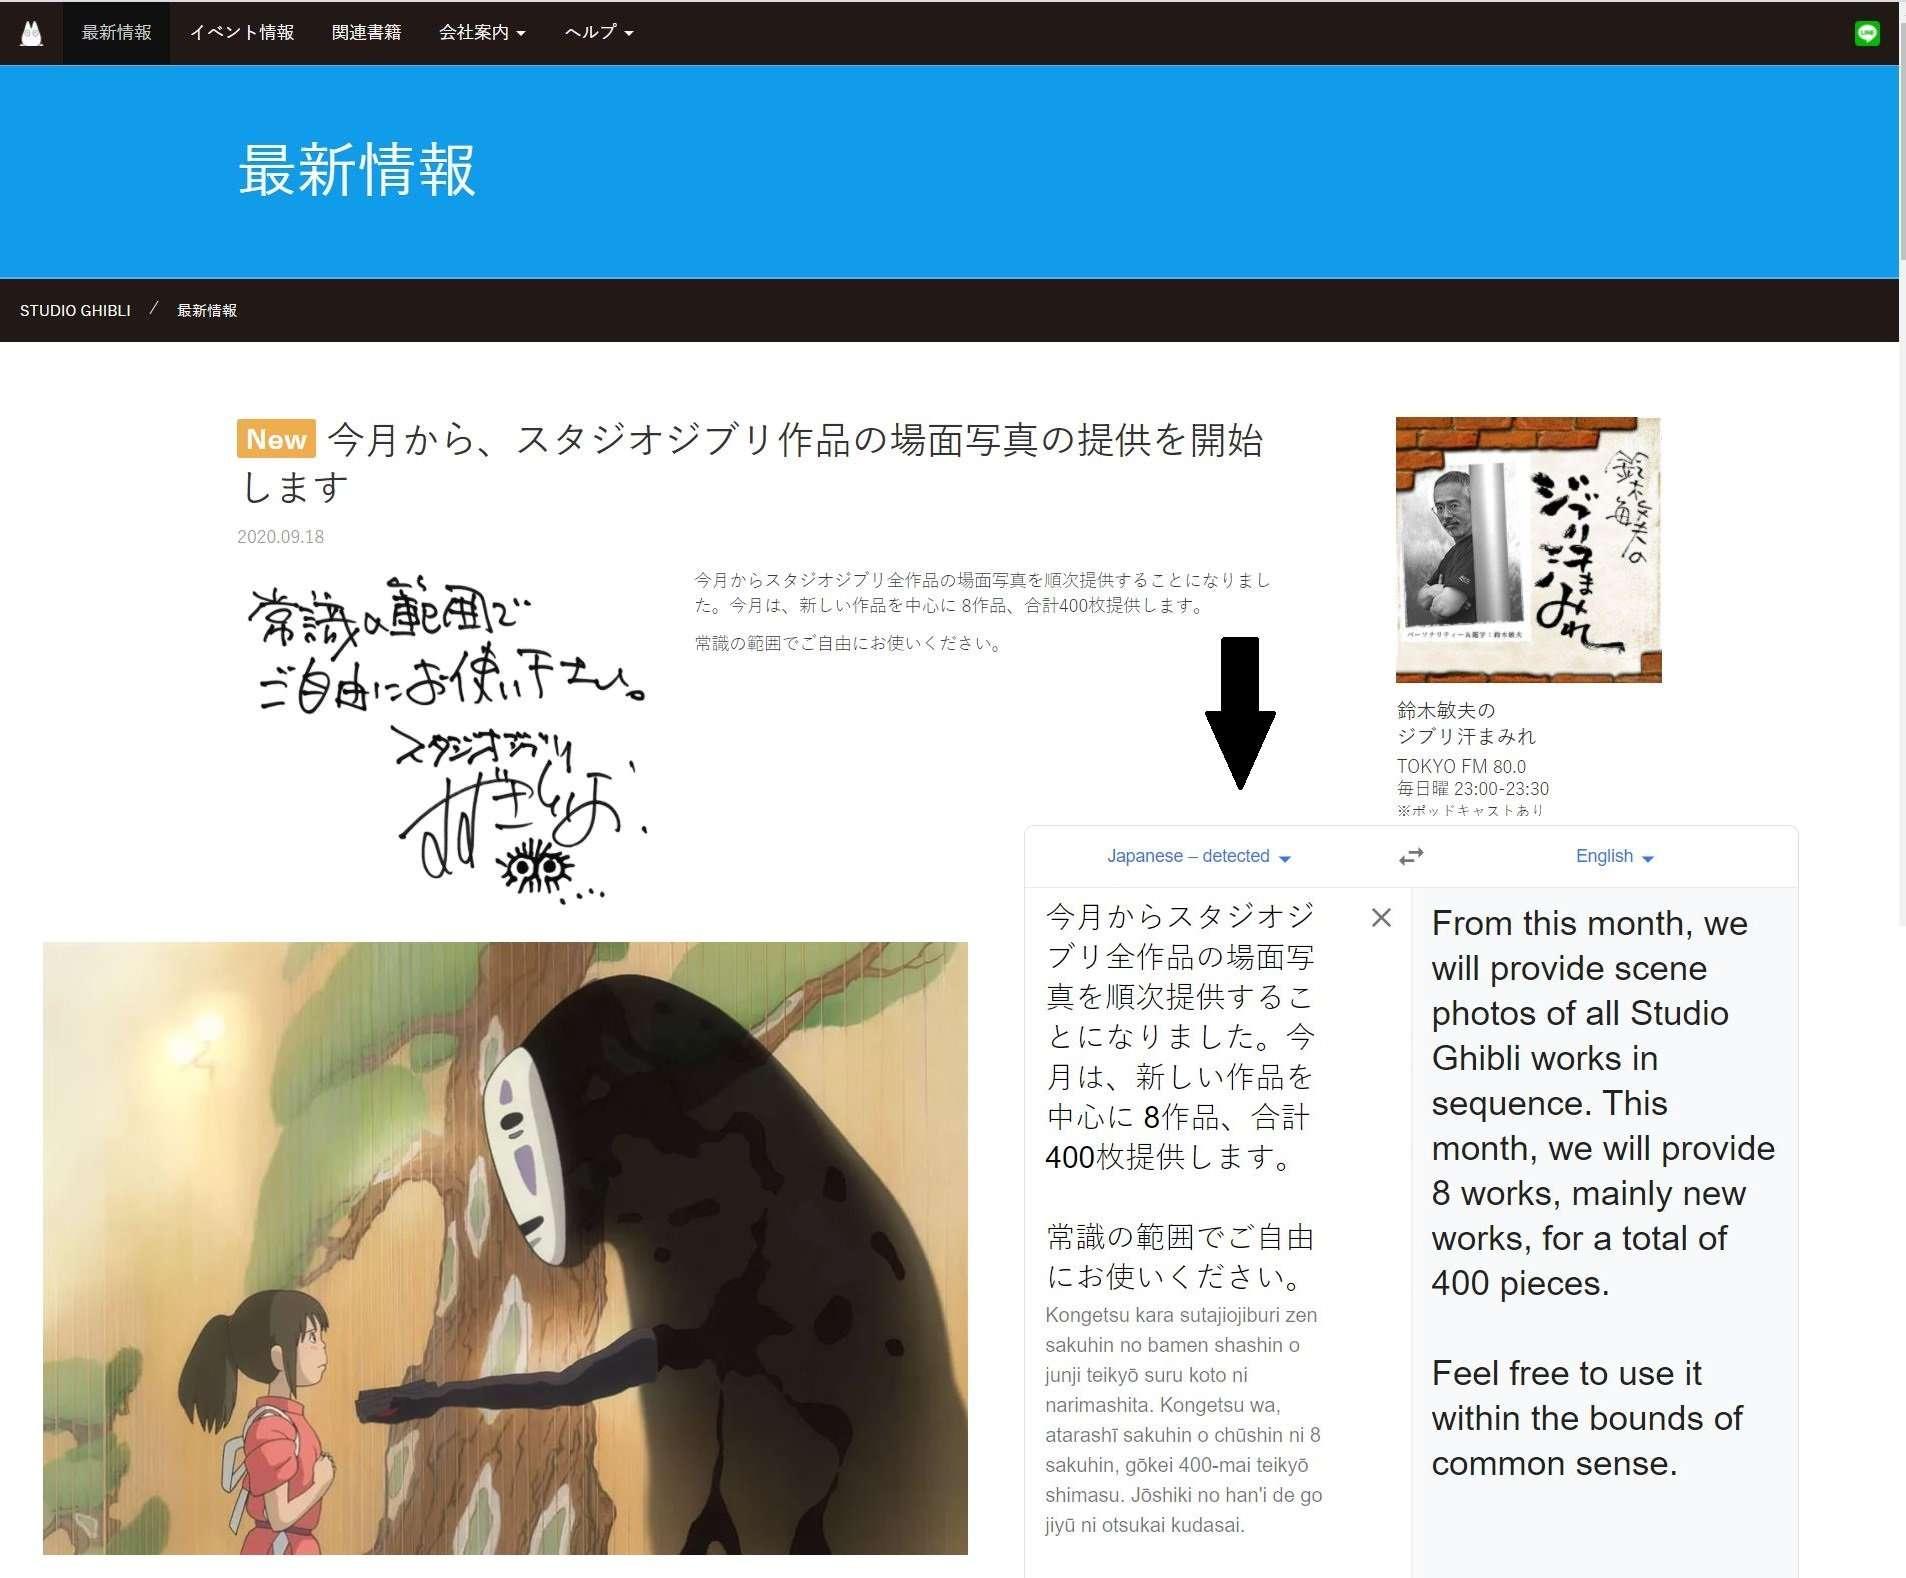 Studio Ghibli's website translation